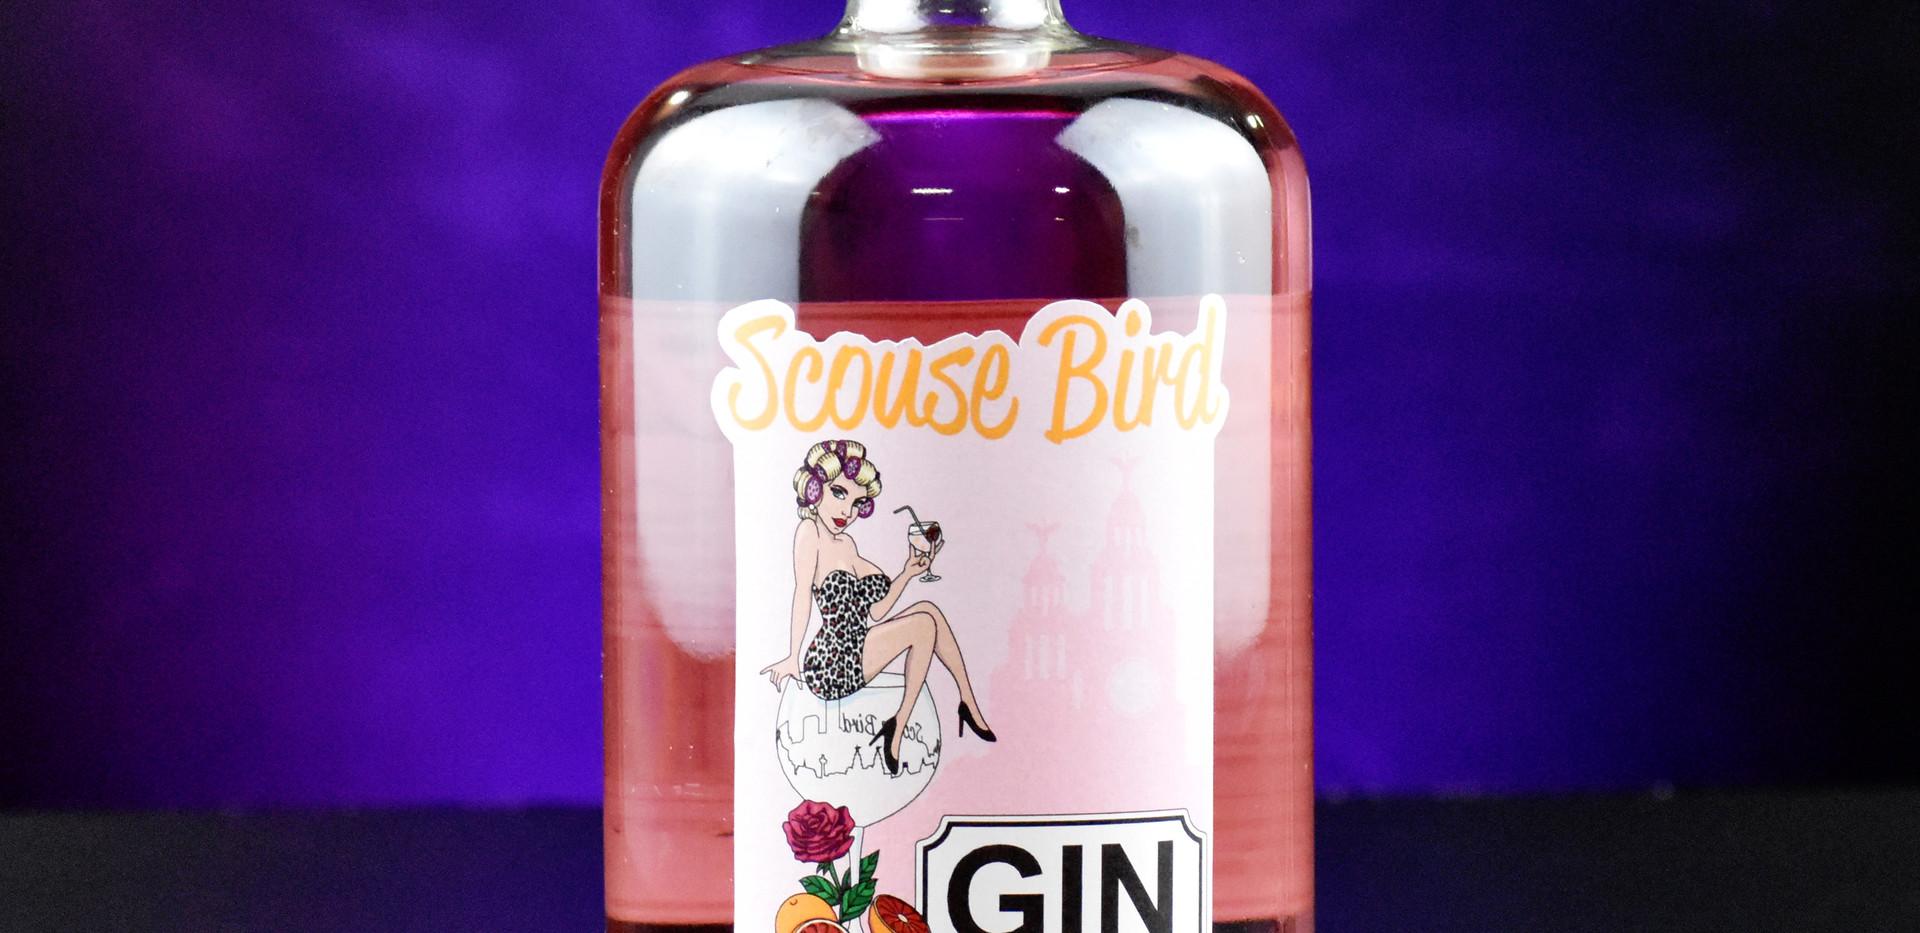 scouse bird gin.jpg